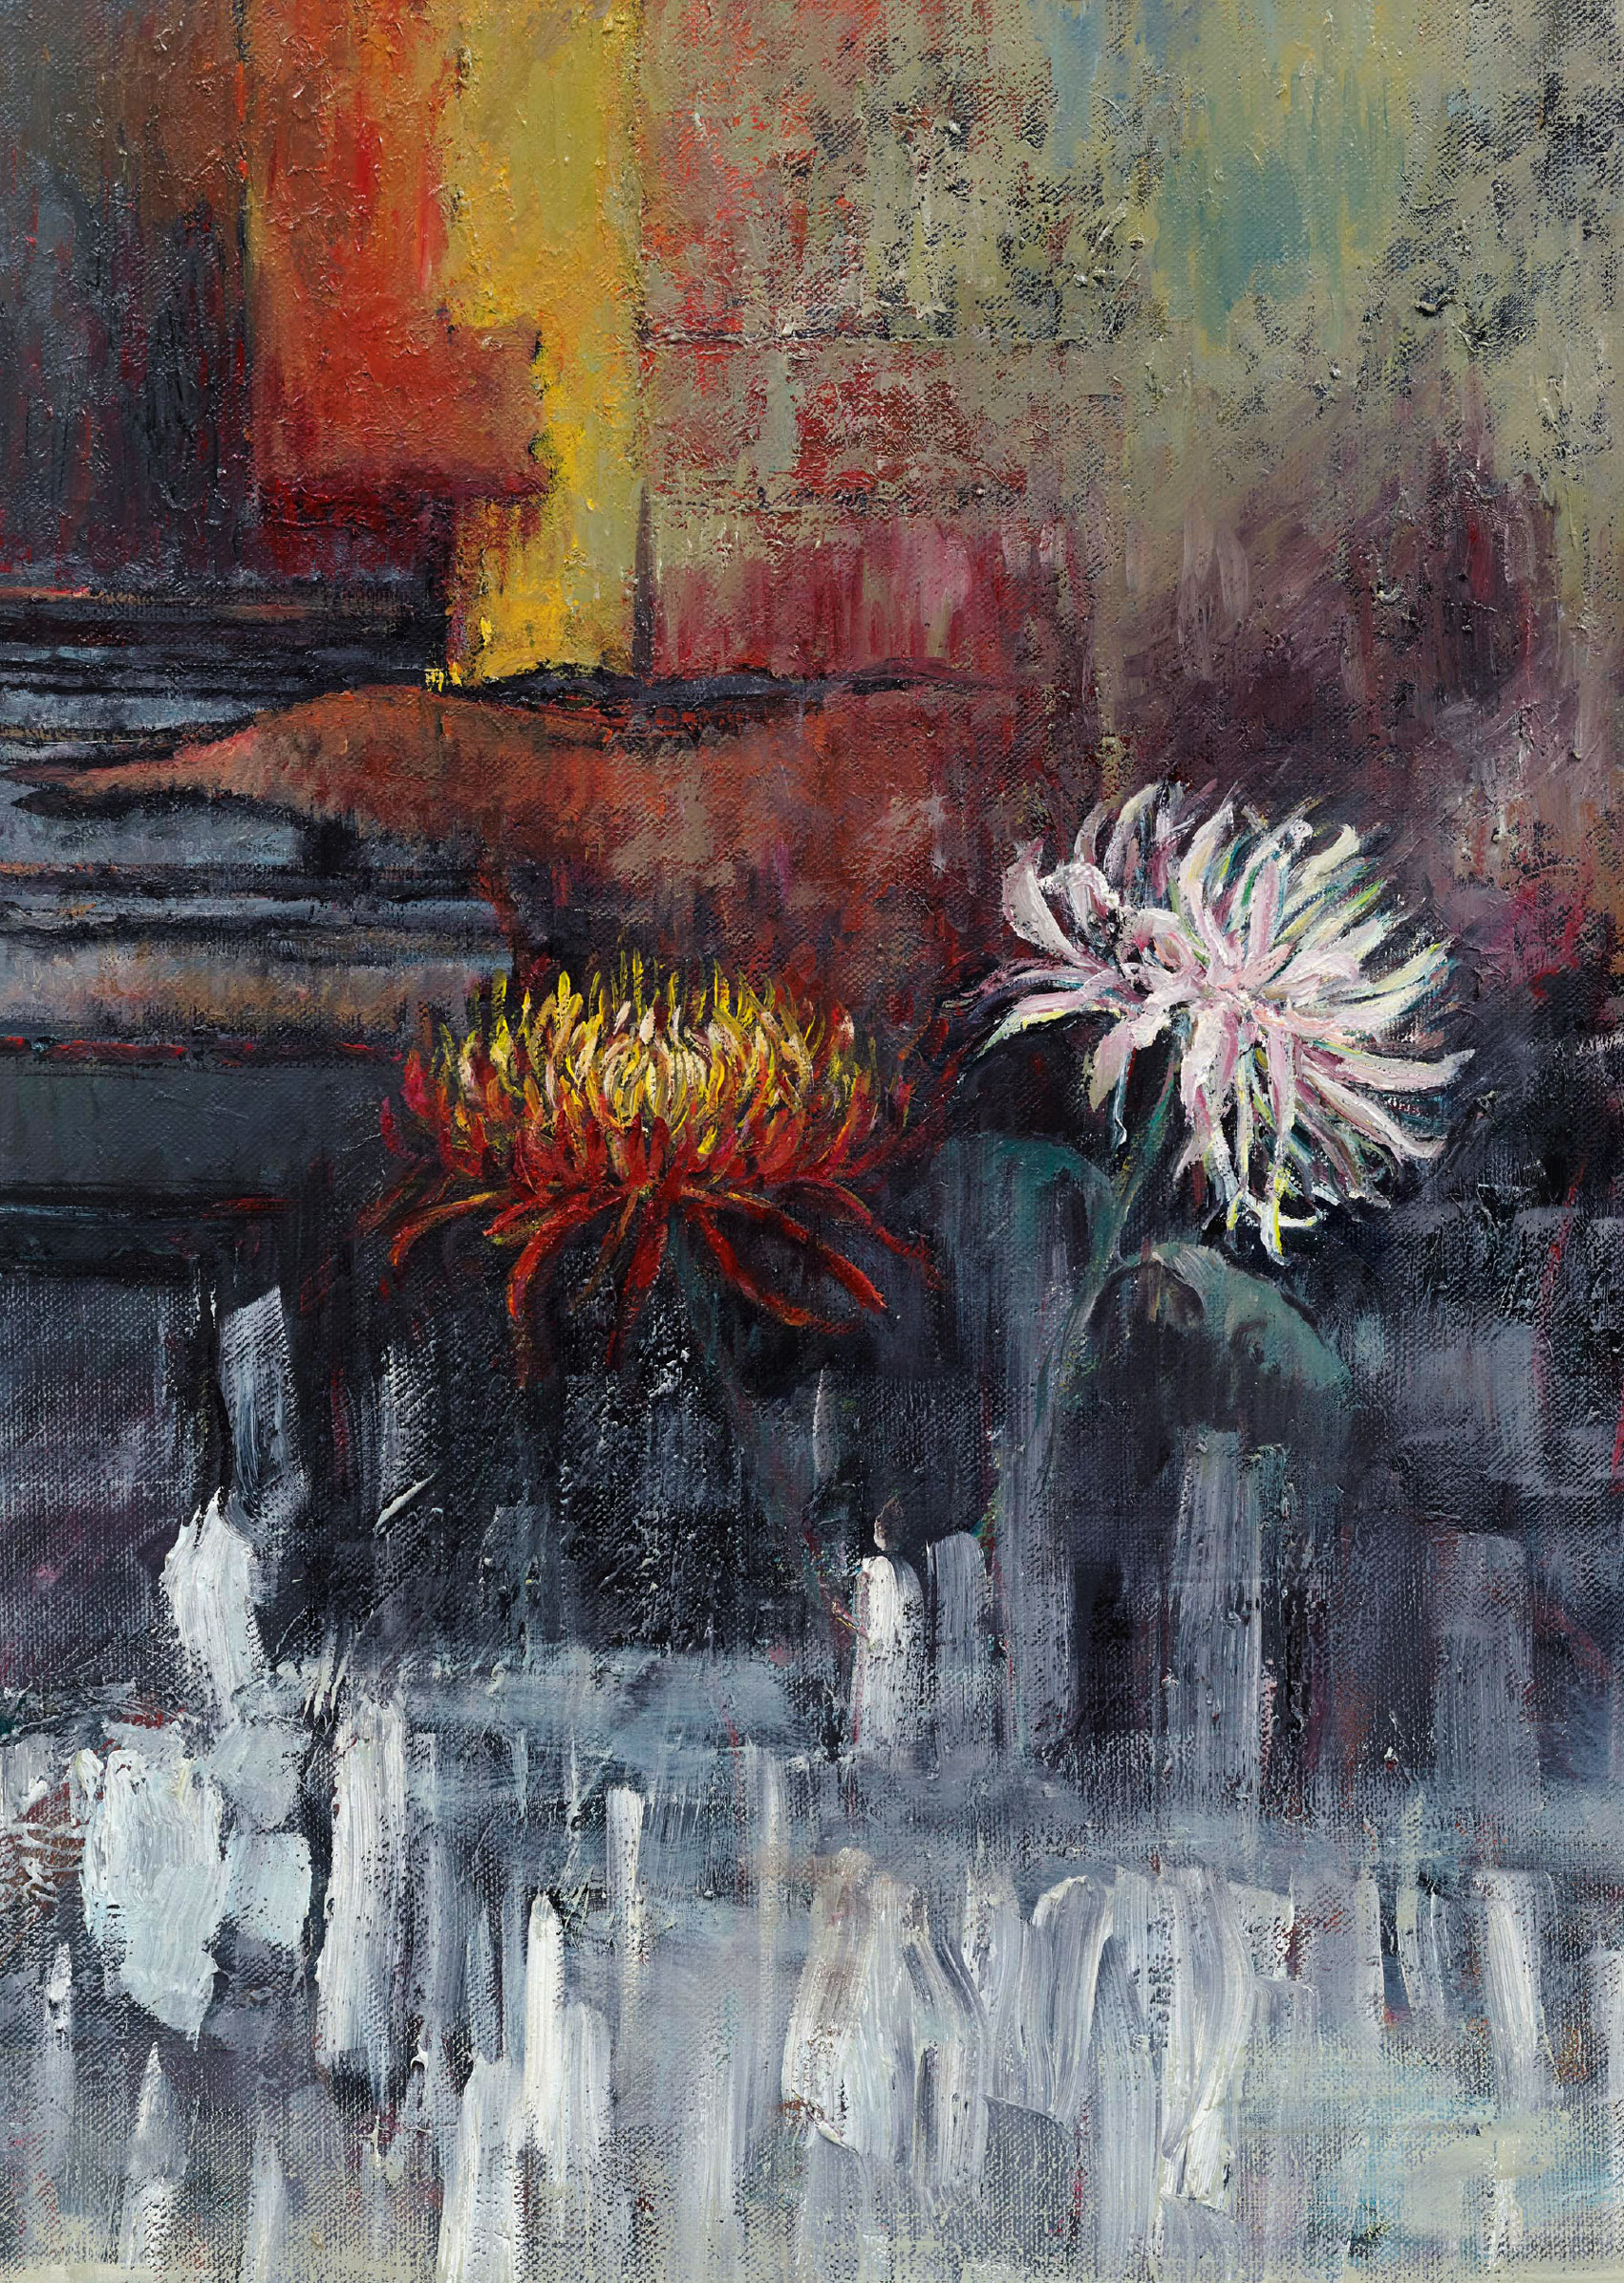 Sabine Moritz  Zwei Chrysanthemen (Braque) 2015 Öl auf Leinwand 81 x 60.5 cm  © Sabine Moritz 2019